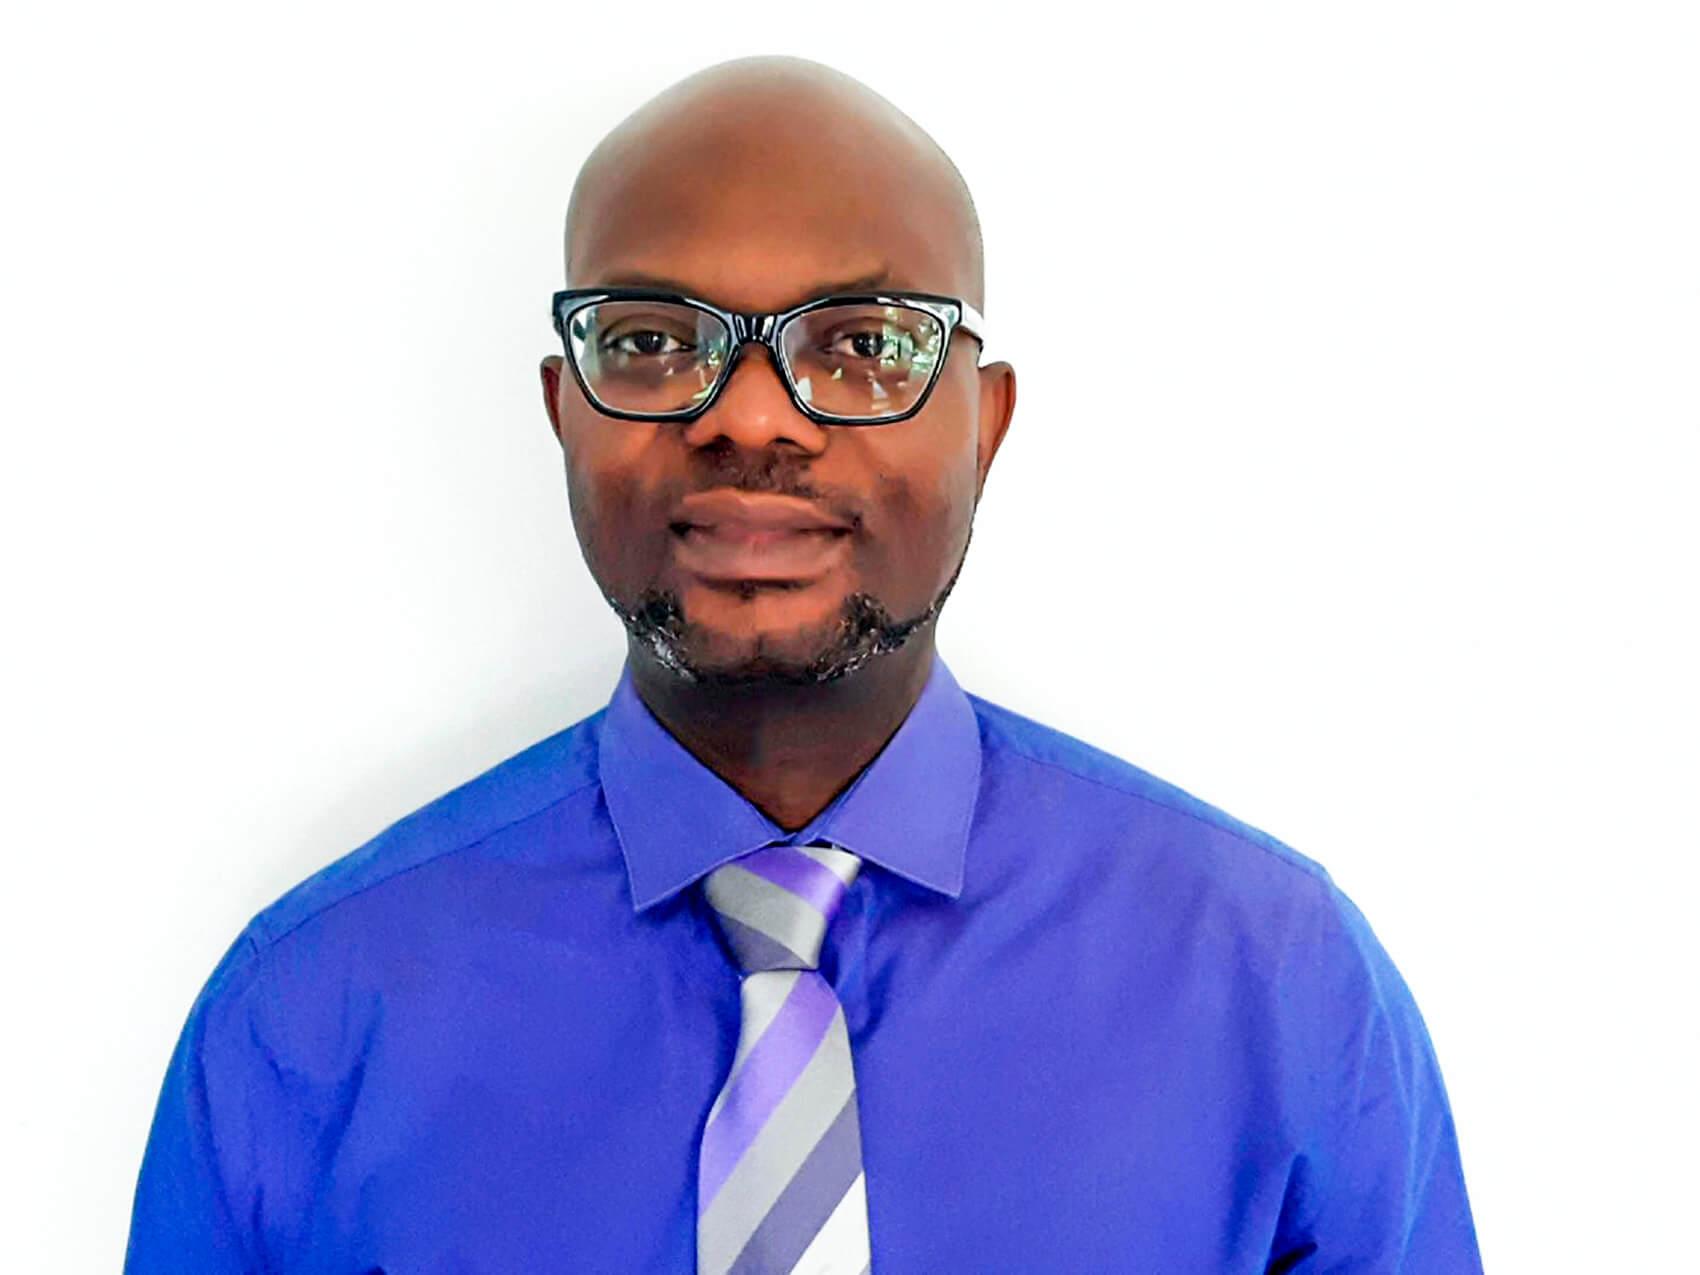 Mathieu Quenum candidat CAQ circonscription Matane-Matapédia